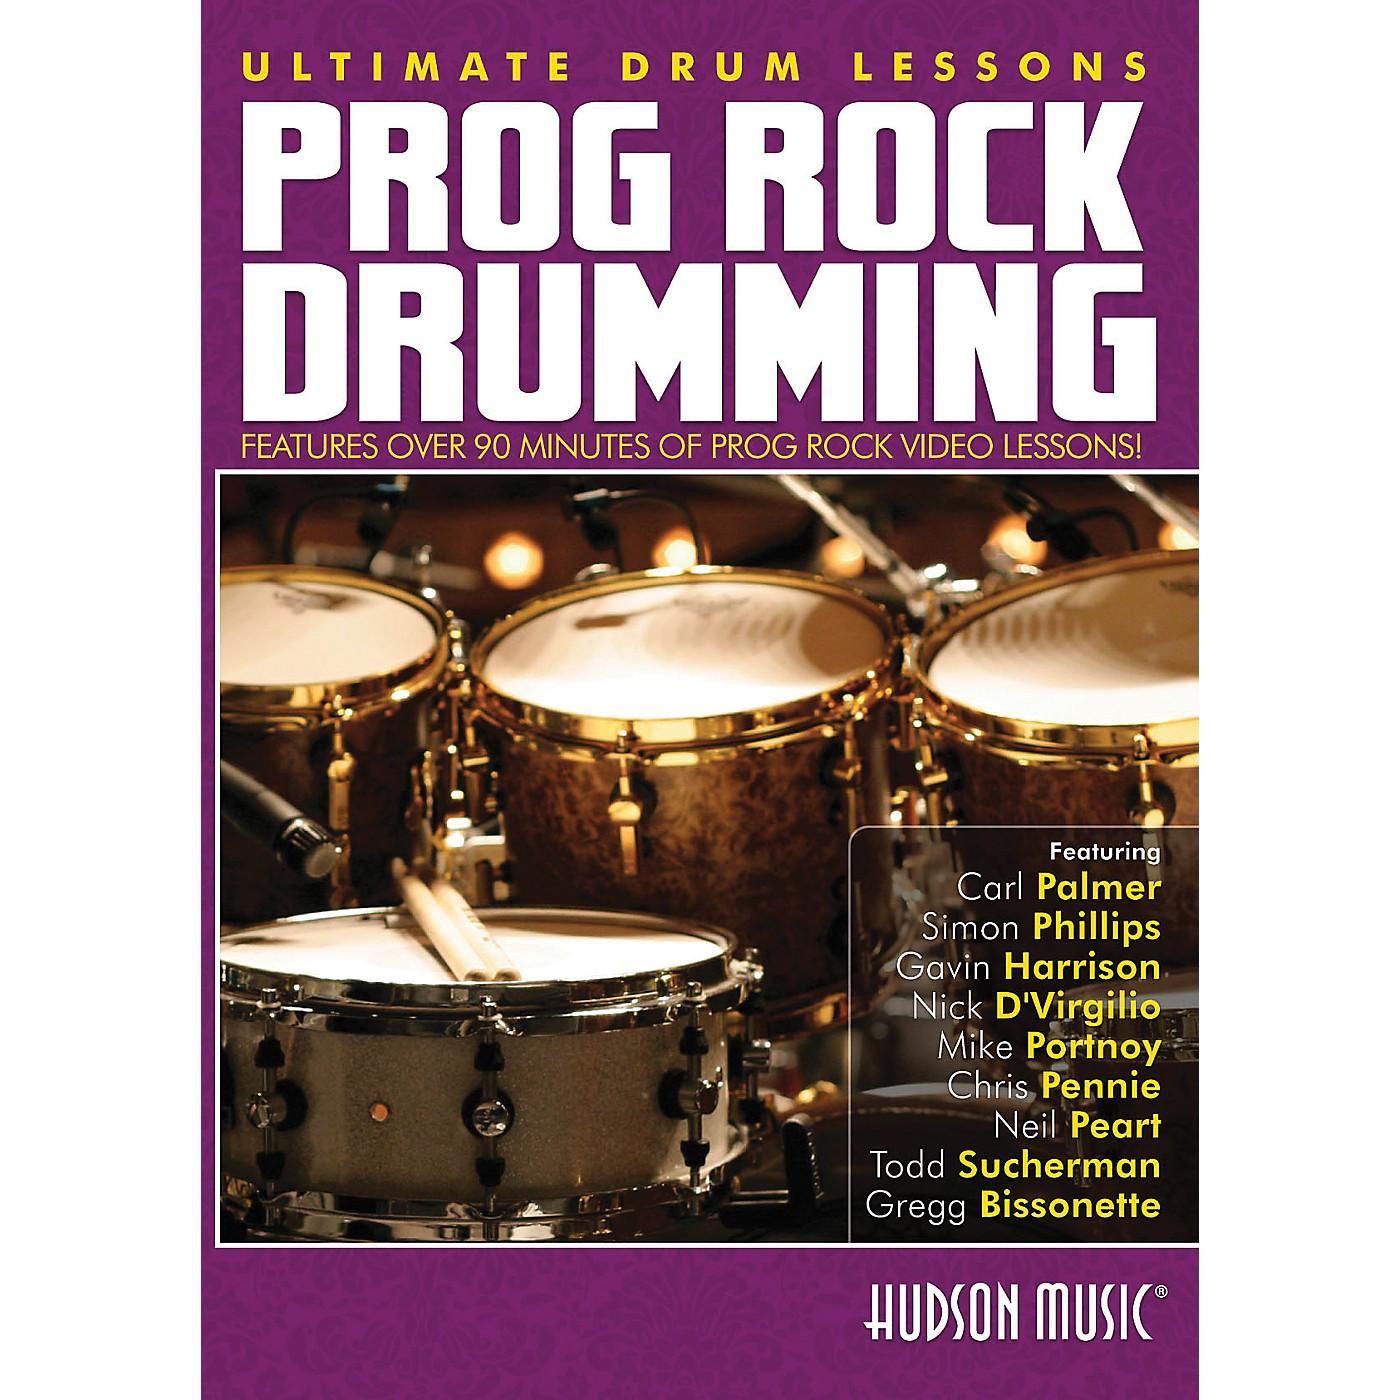 Hudson Music Progressive Rock Ultimate Drum Lessons Series Hudson DVD thumbnail